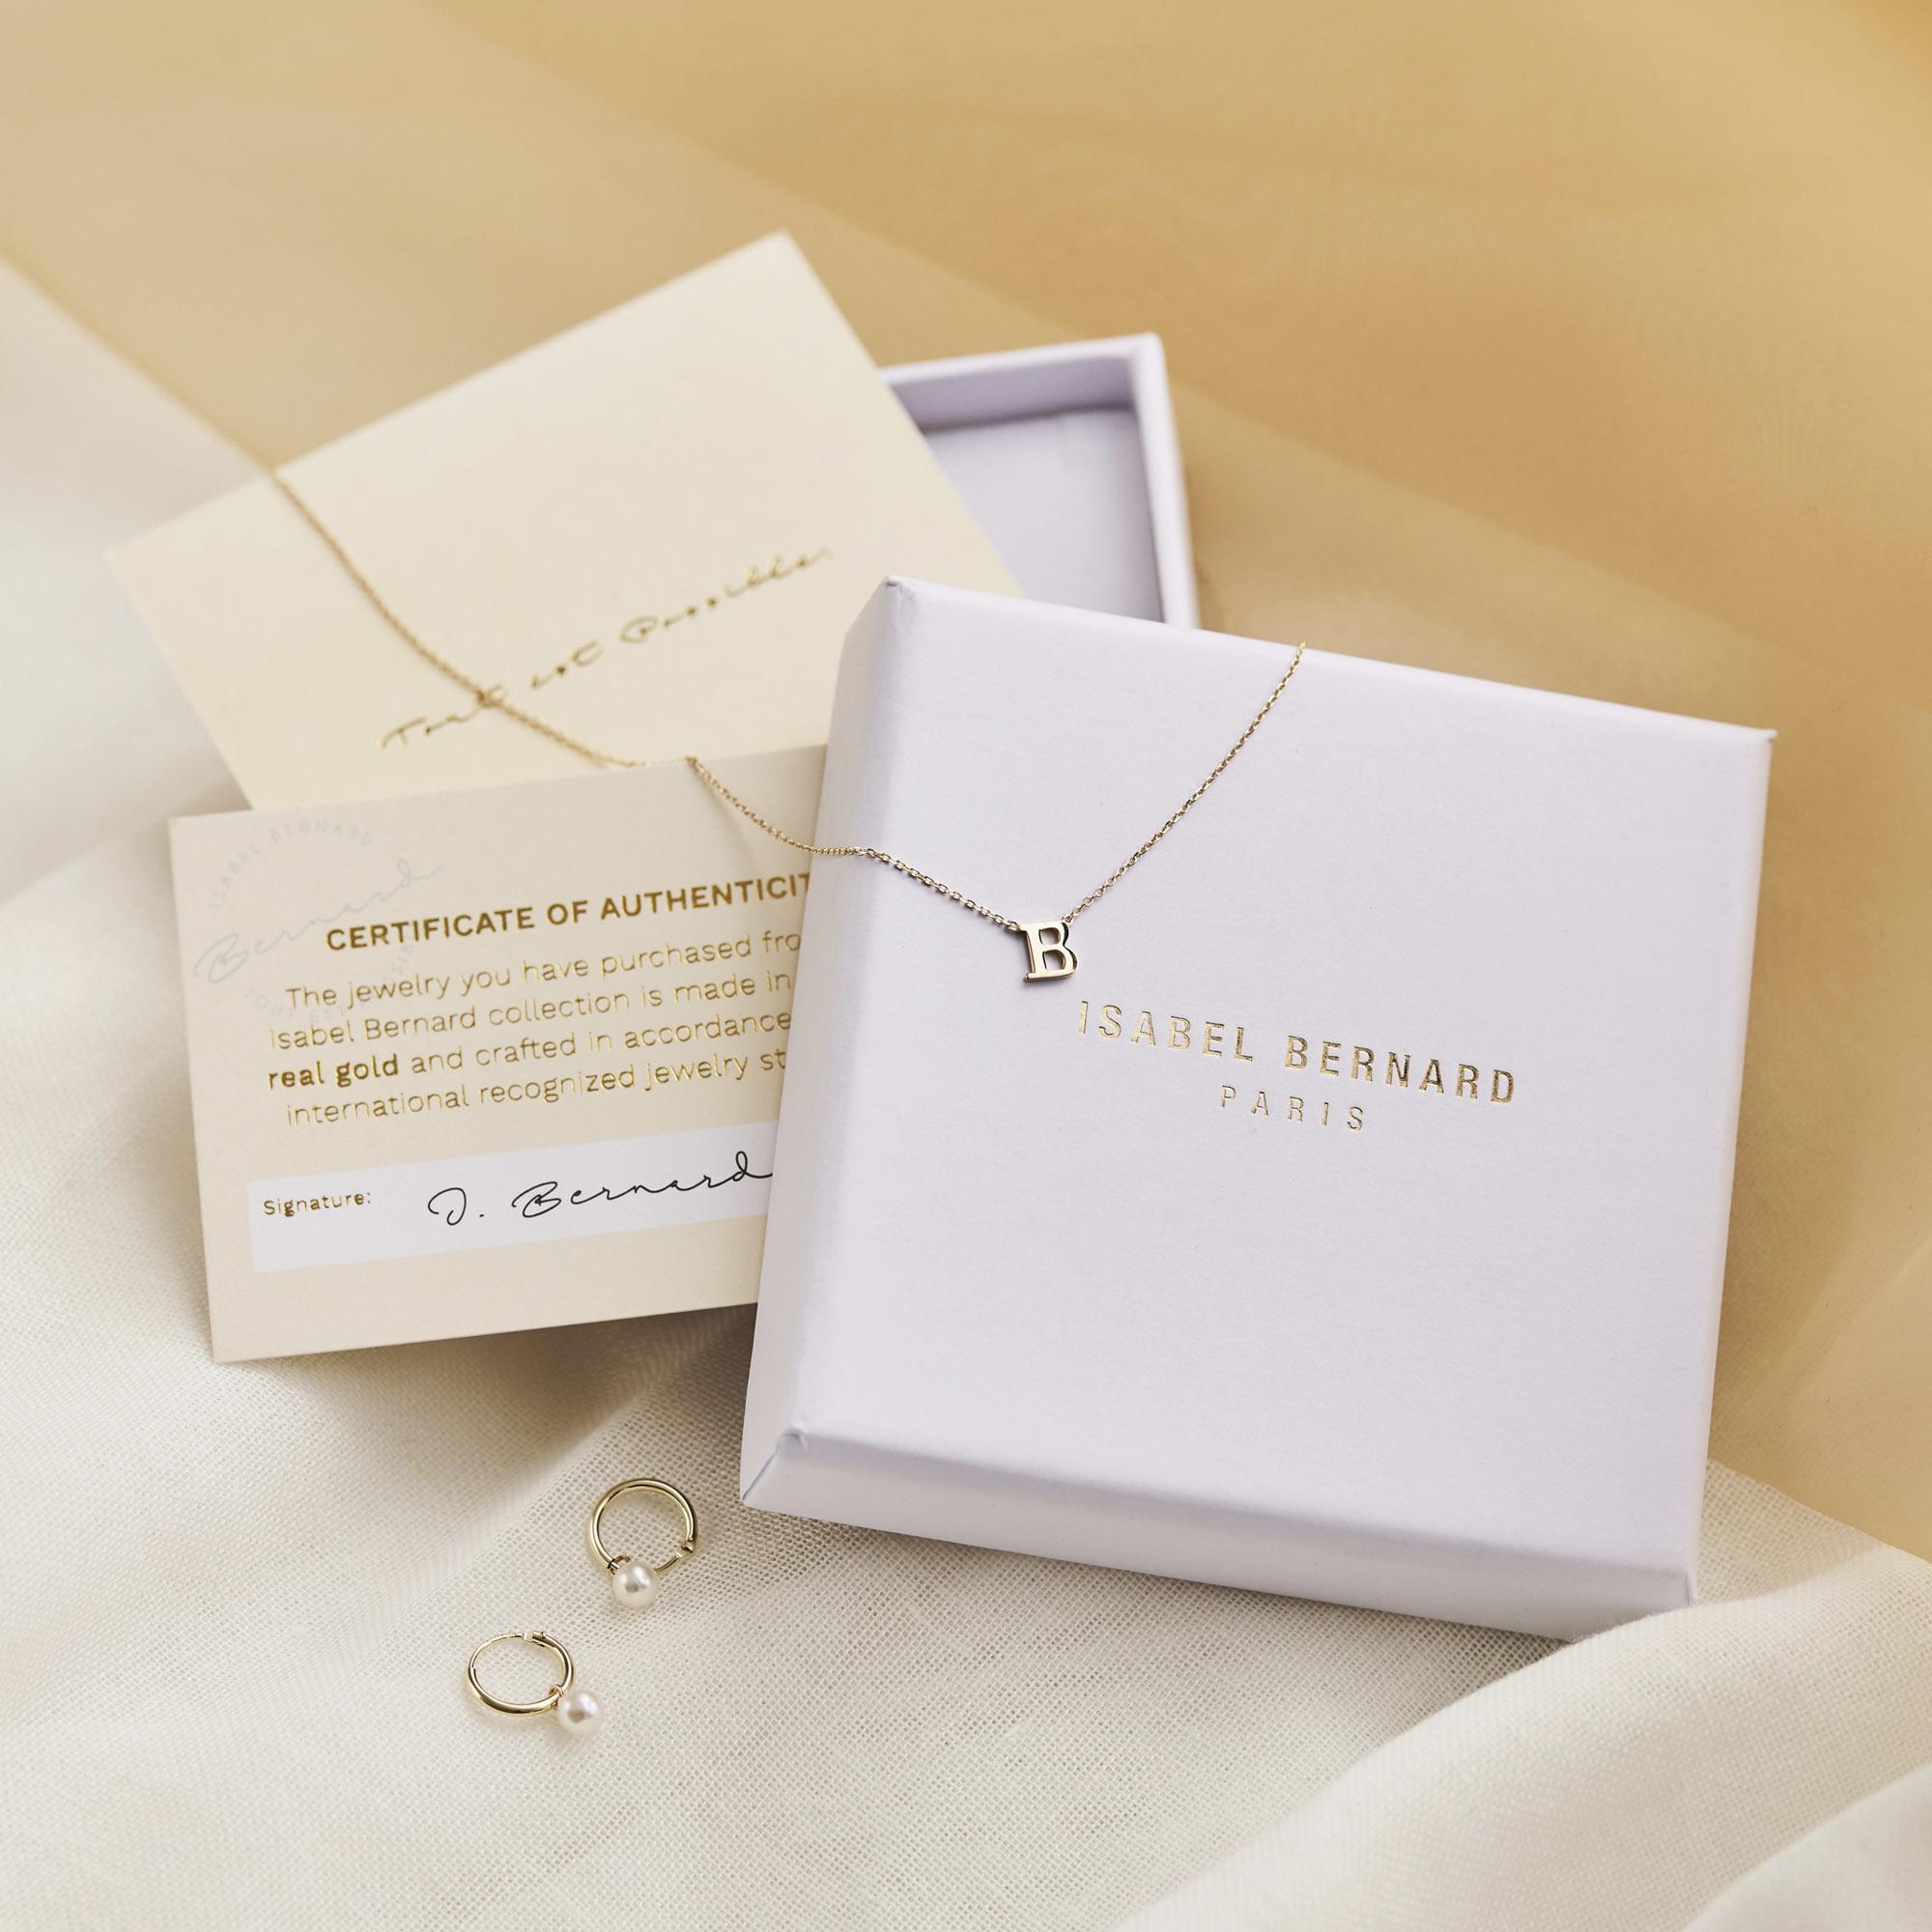 Isabel Bernard Saint Germain Felie 14 karat white gold cube initial charm with letter